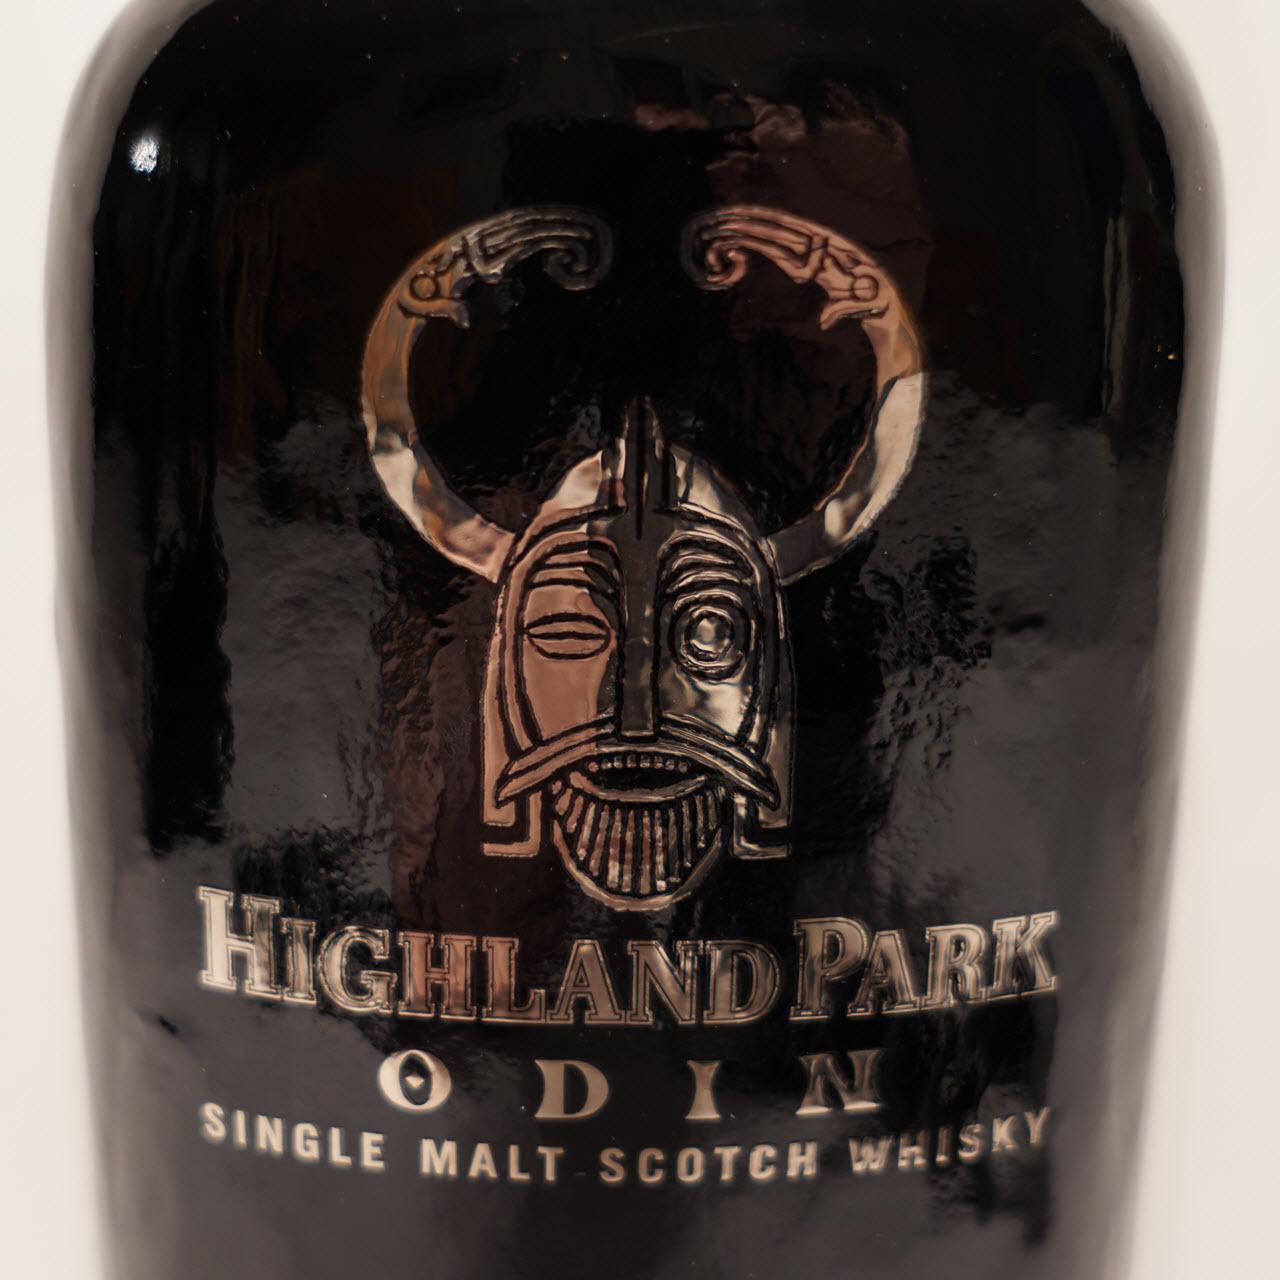 Highland Park Odin 16 YO - The Valhalla Collection